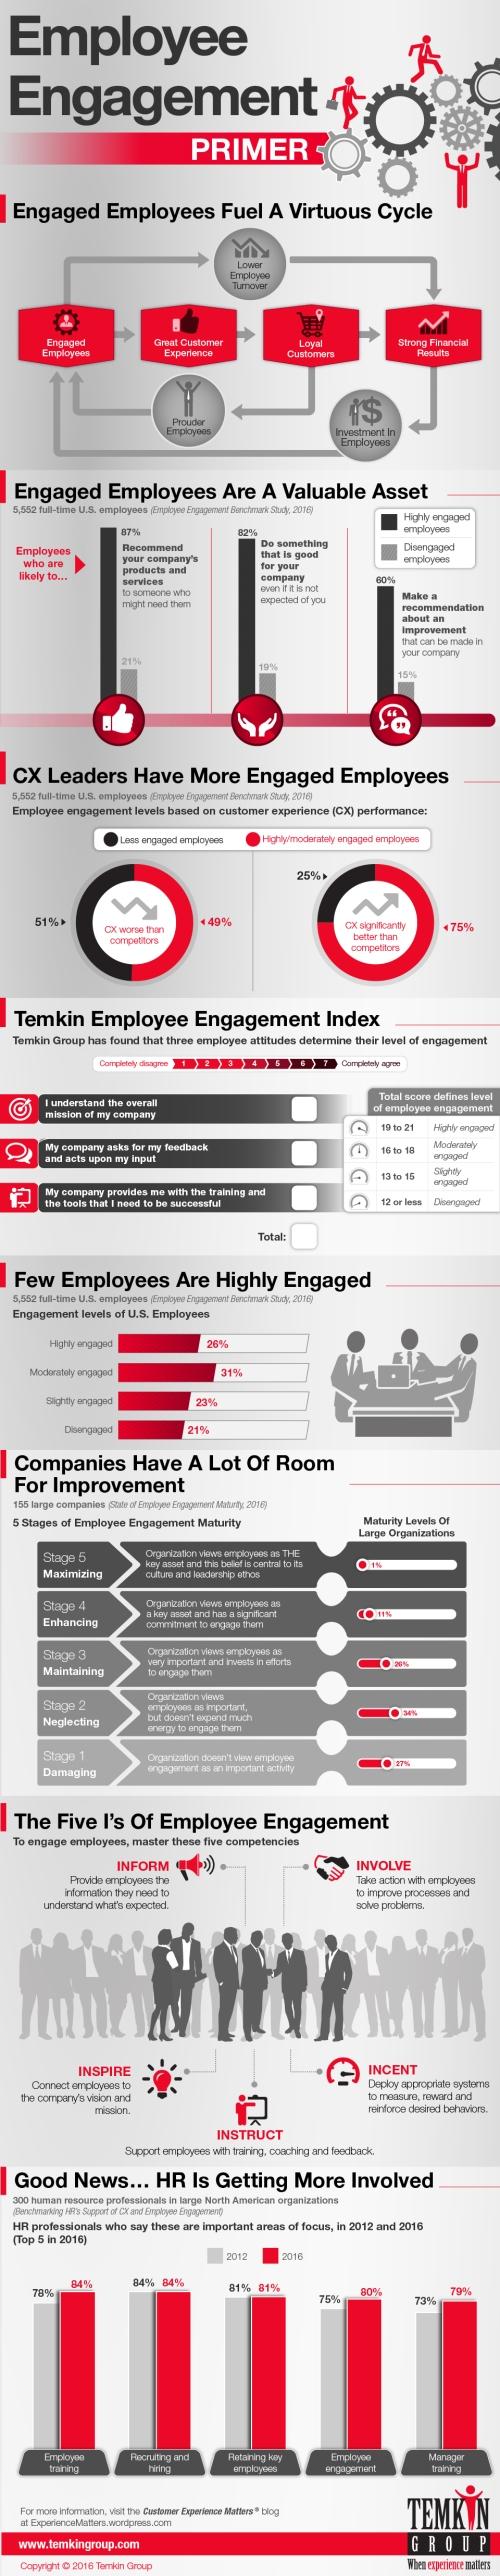 1609_Employee Engagement Infographic